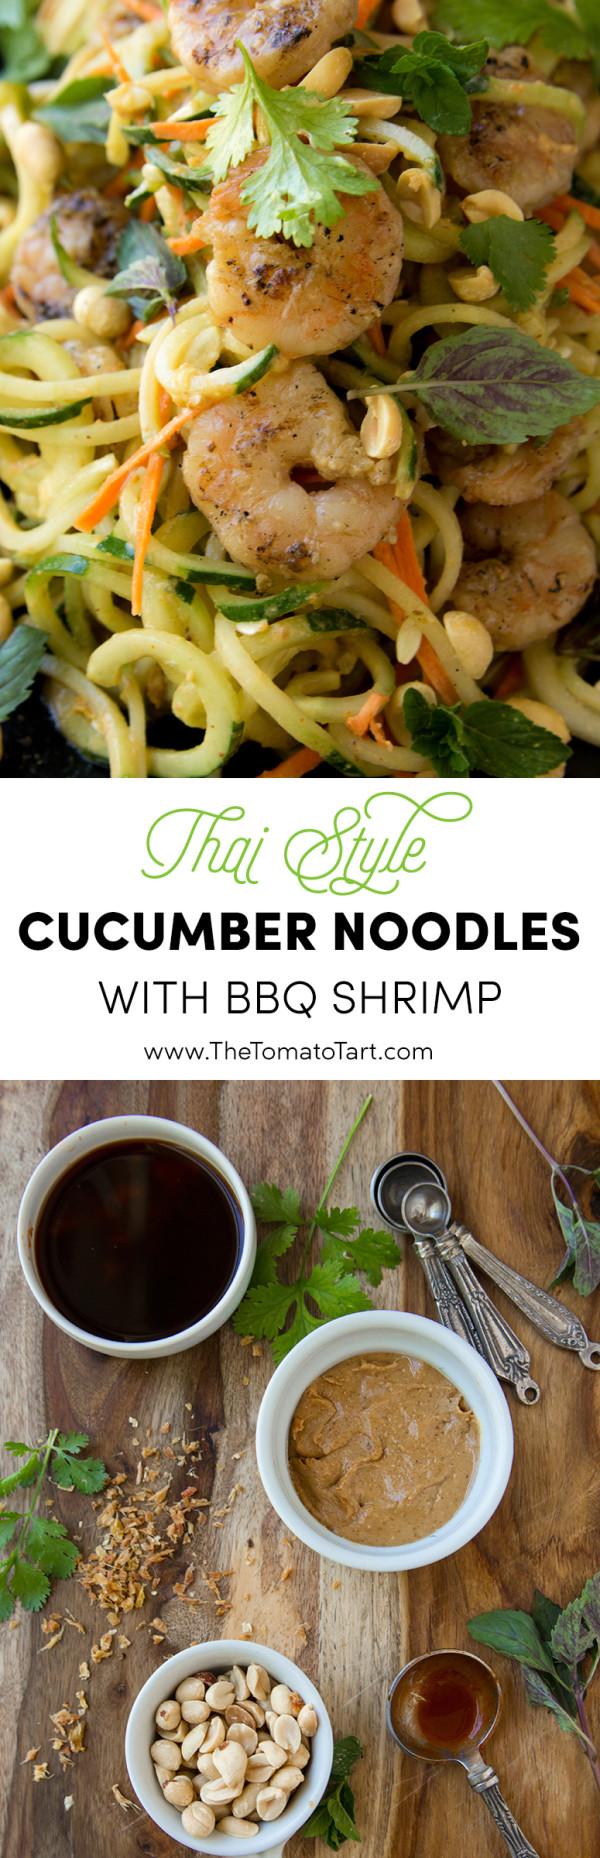 Thai Cucumber Noodle Salad with BBQ Shrimp. Grain Free, Gluten Free, Paleo Option